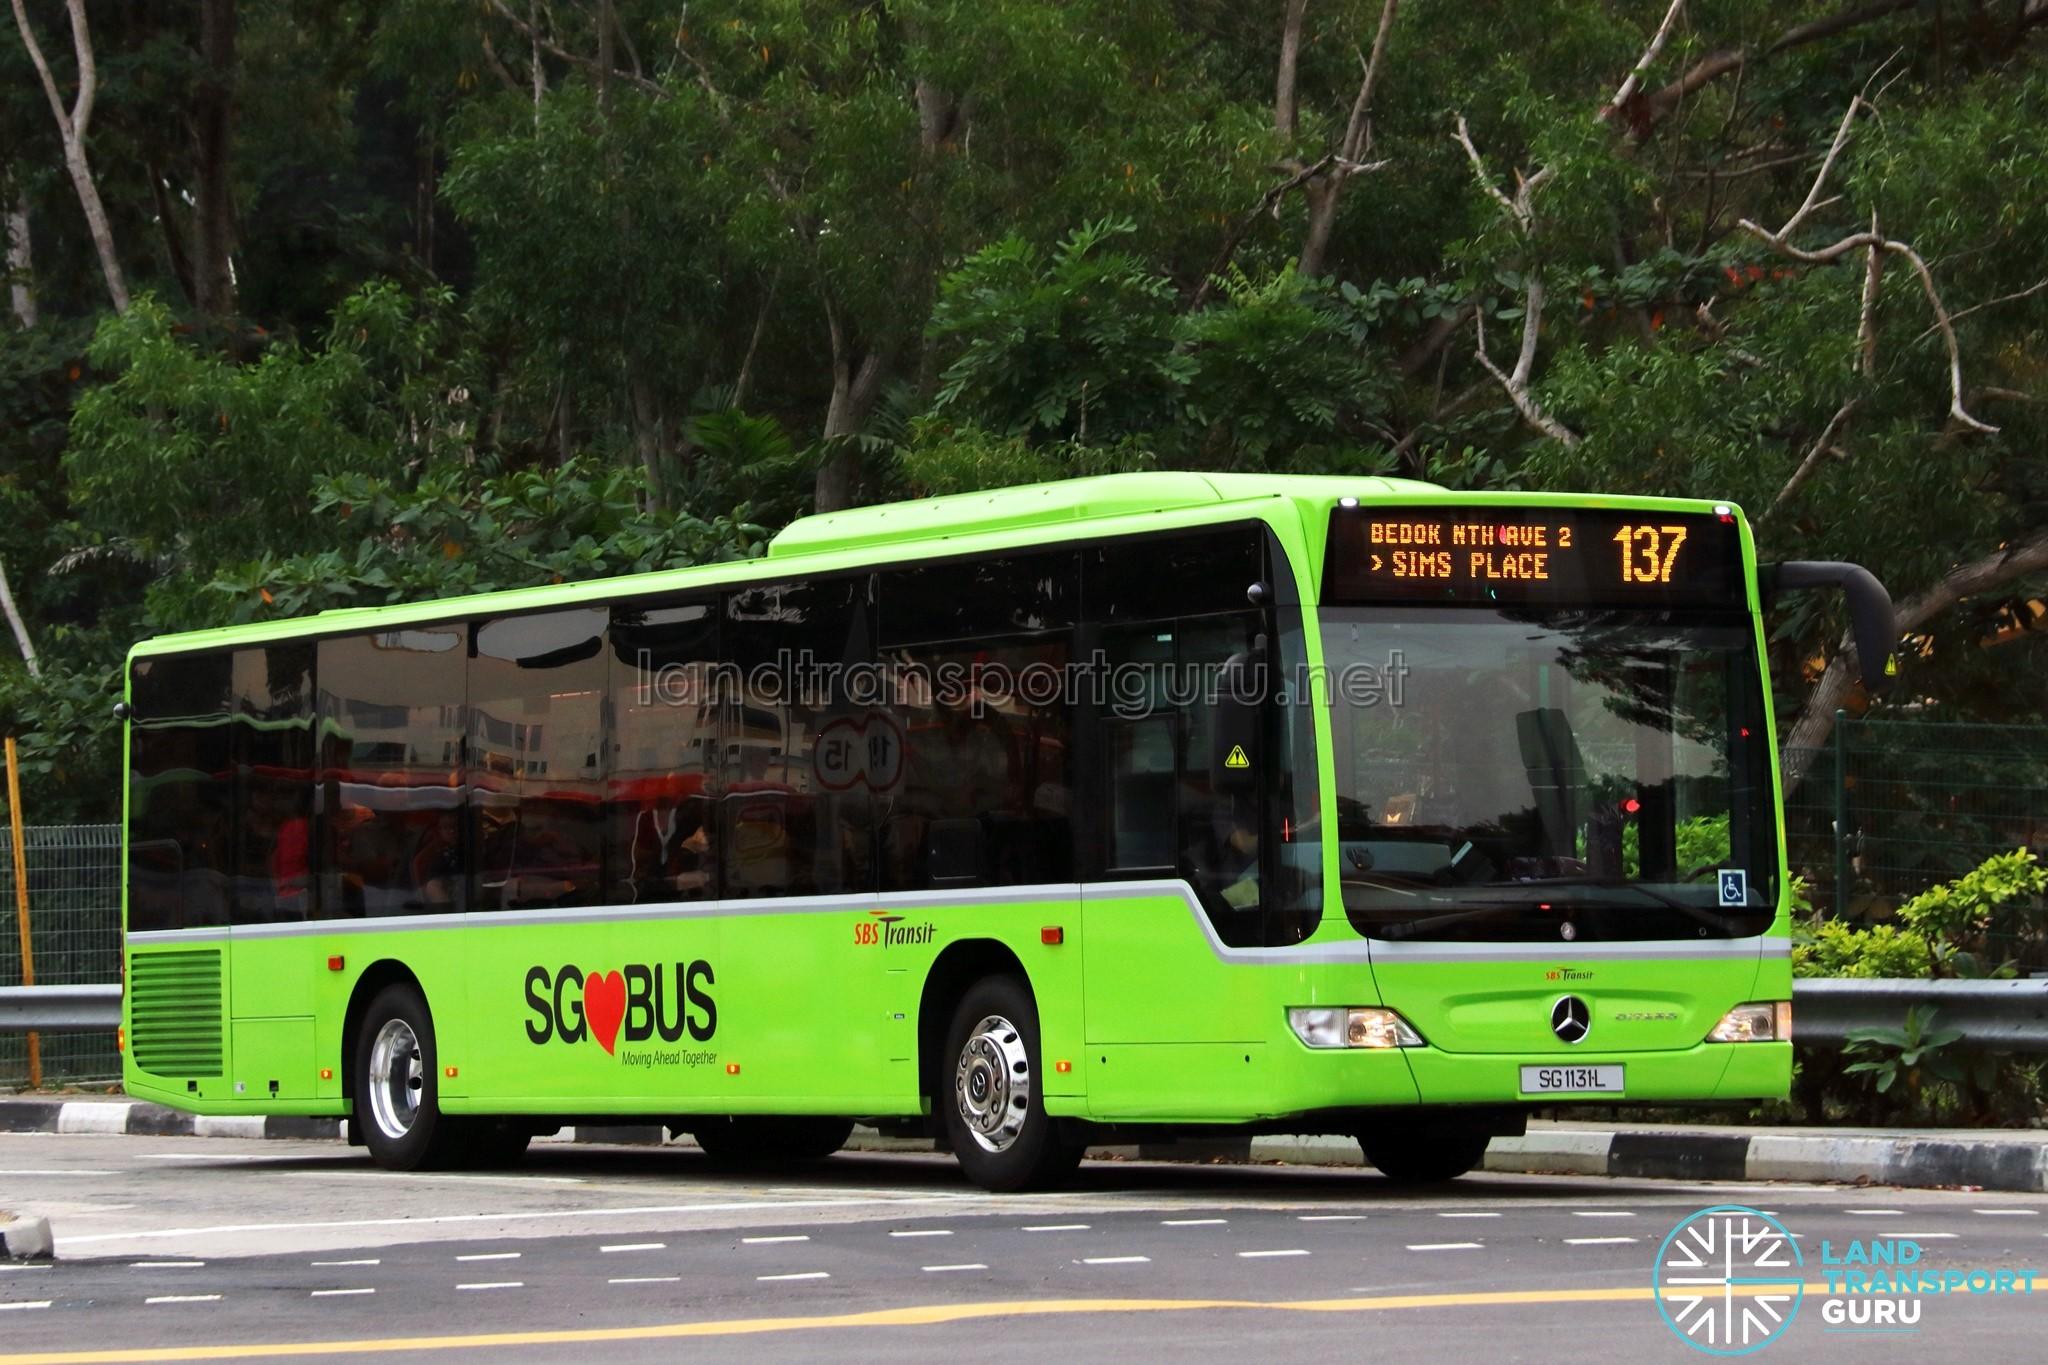 SBST Mercedes-Benz O530 Citaro (SG1131L) - Service 137